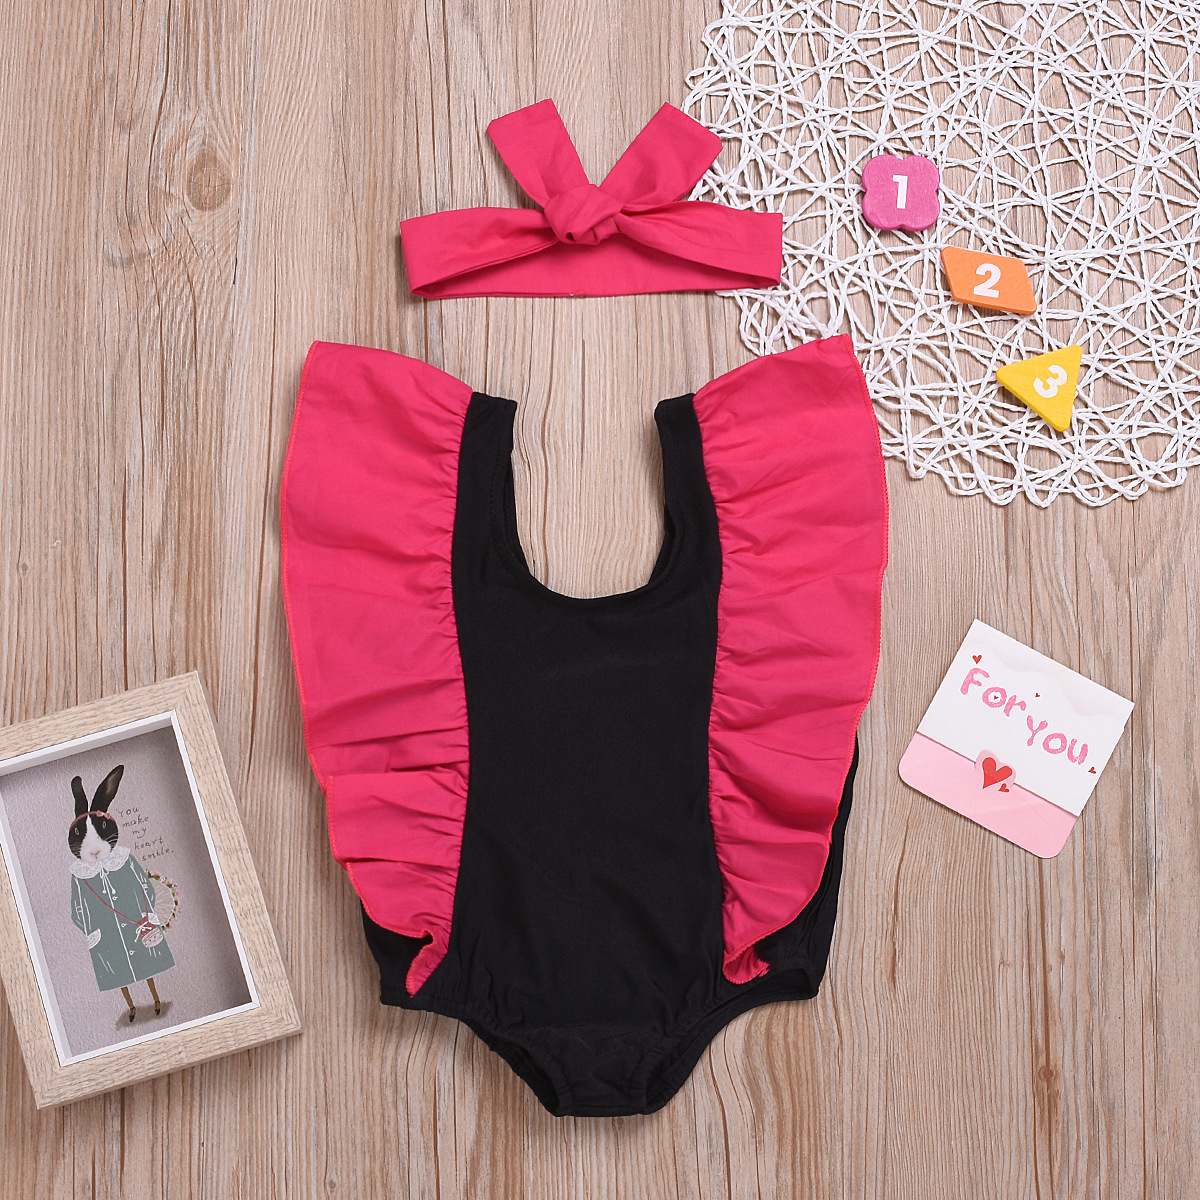 Girl'S Swimsuit Two-Piece Set Sleeveless Backless Trend KID'S Swimwear Stitching Like Clothing Headscarf Fashion